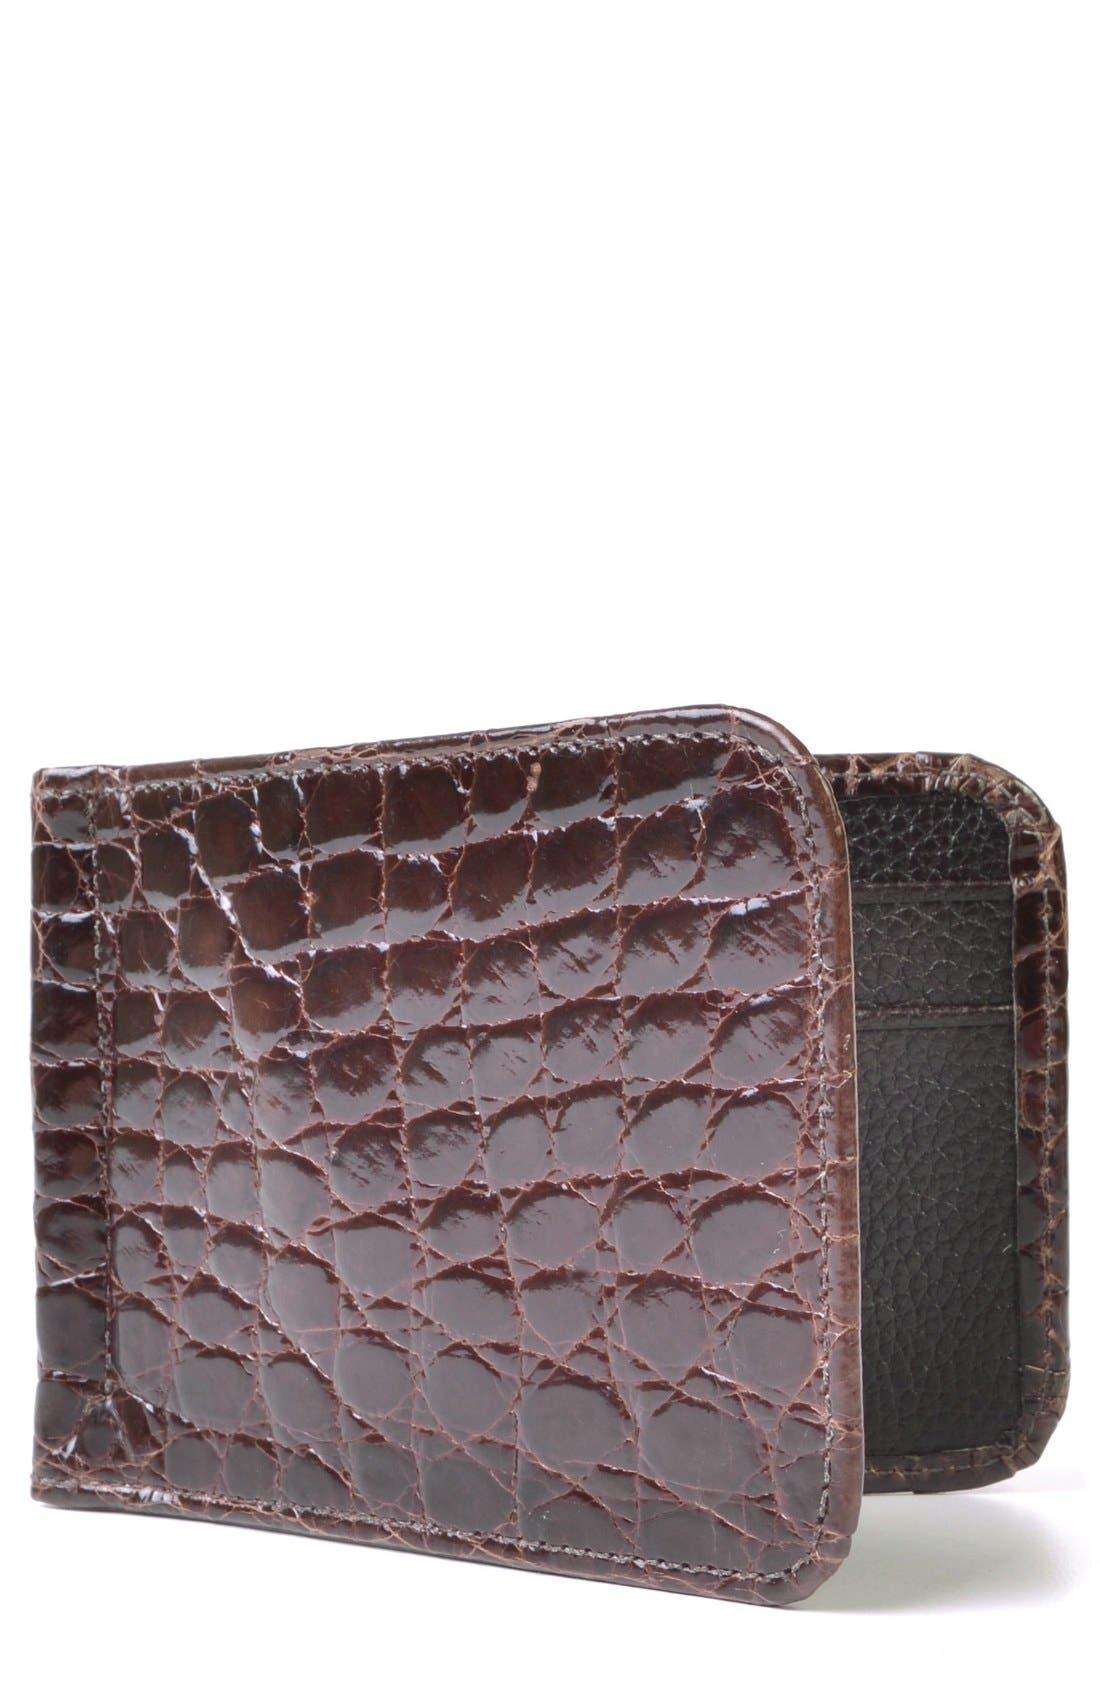 'Joseph' Genuine American Alligator Leather Money Clip Wallet,                             Main thumbnail 1, color,                             215